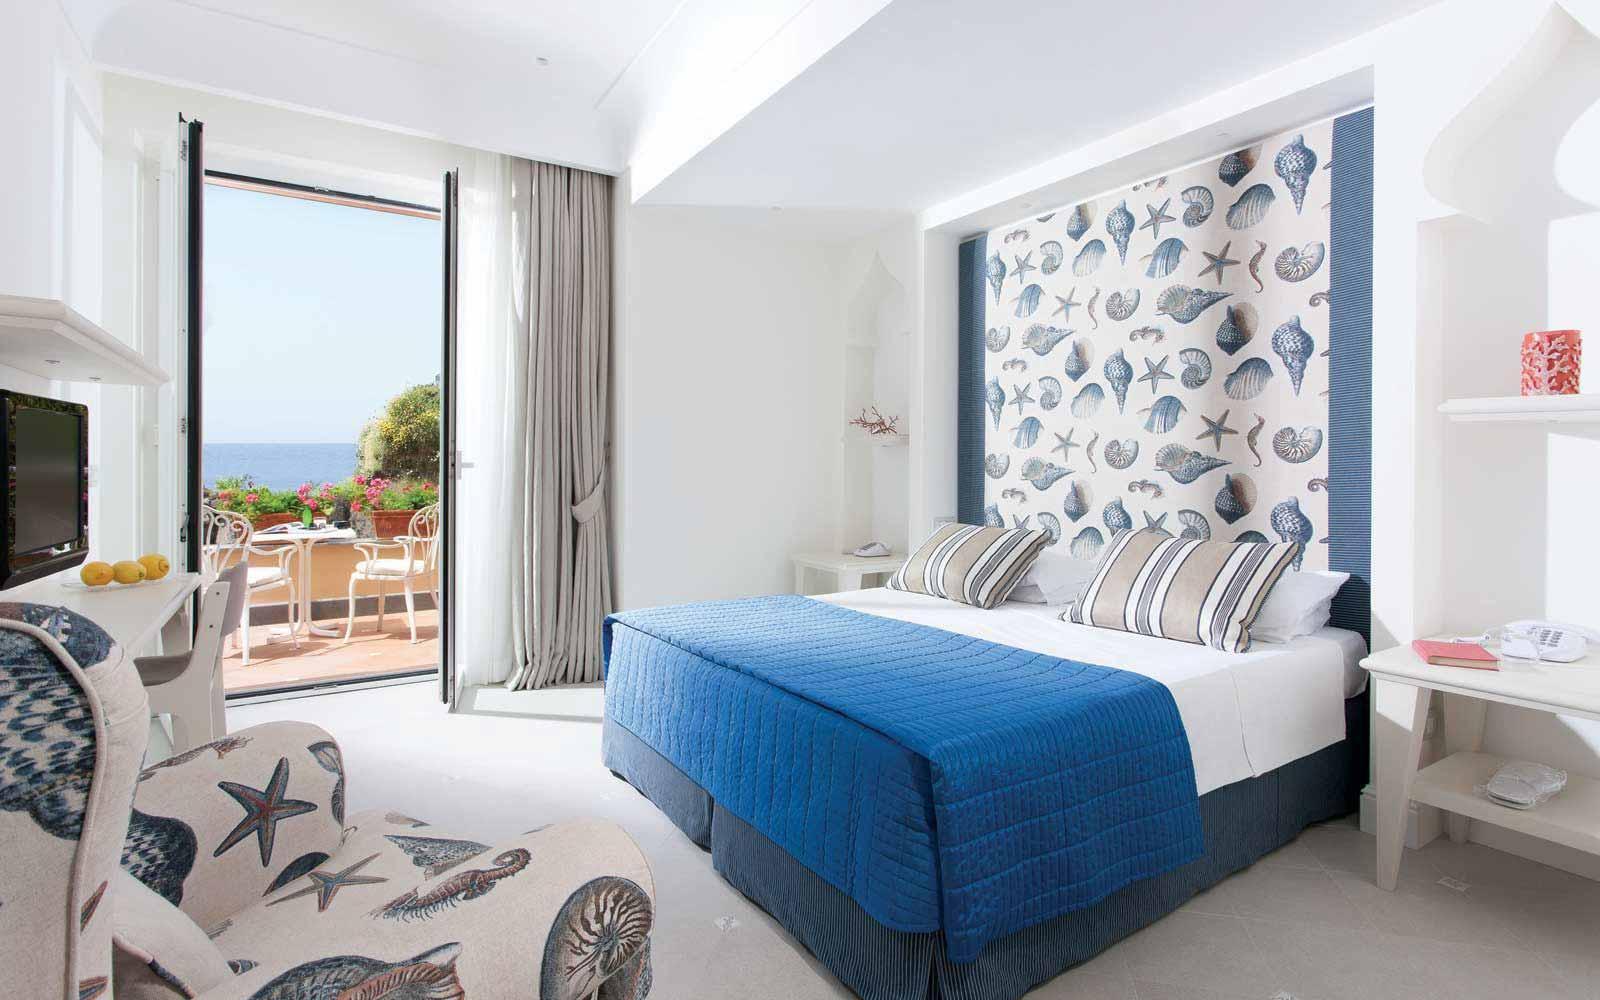 Deluxe room at Hotel Corallo